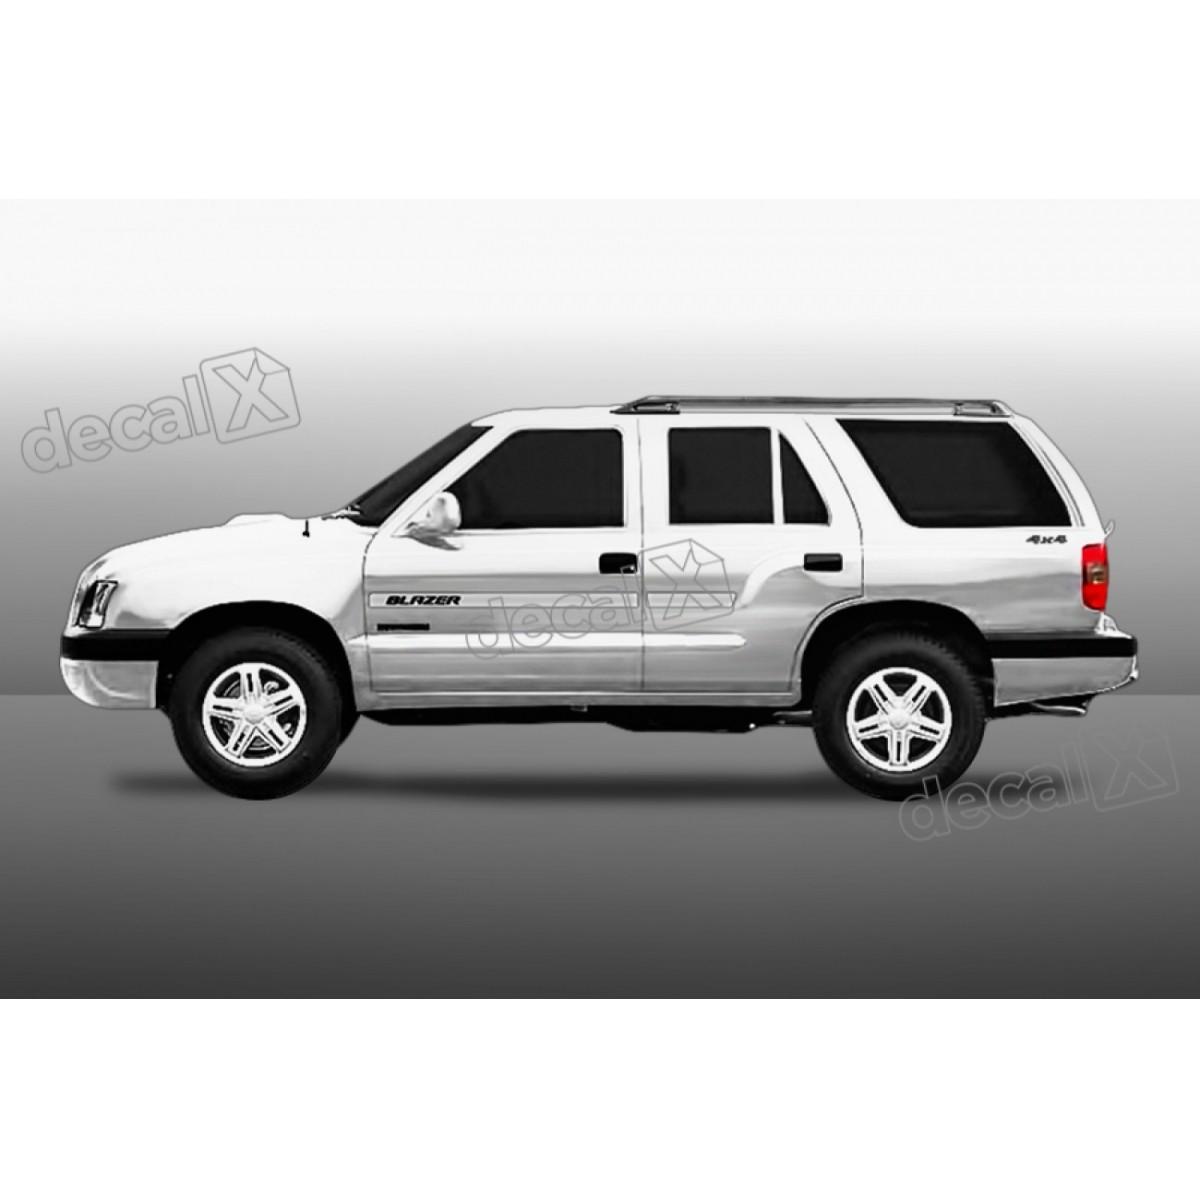 Kit Friso Adesivo Lateral Resinado Chevrolet Blazer Transpar